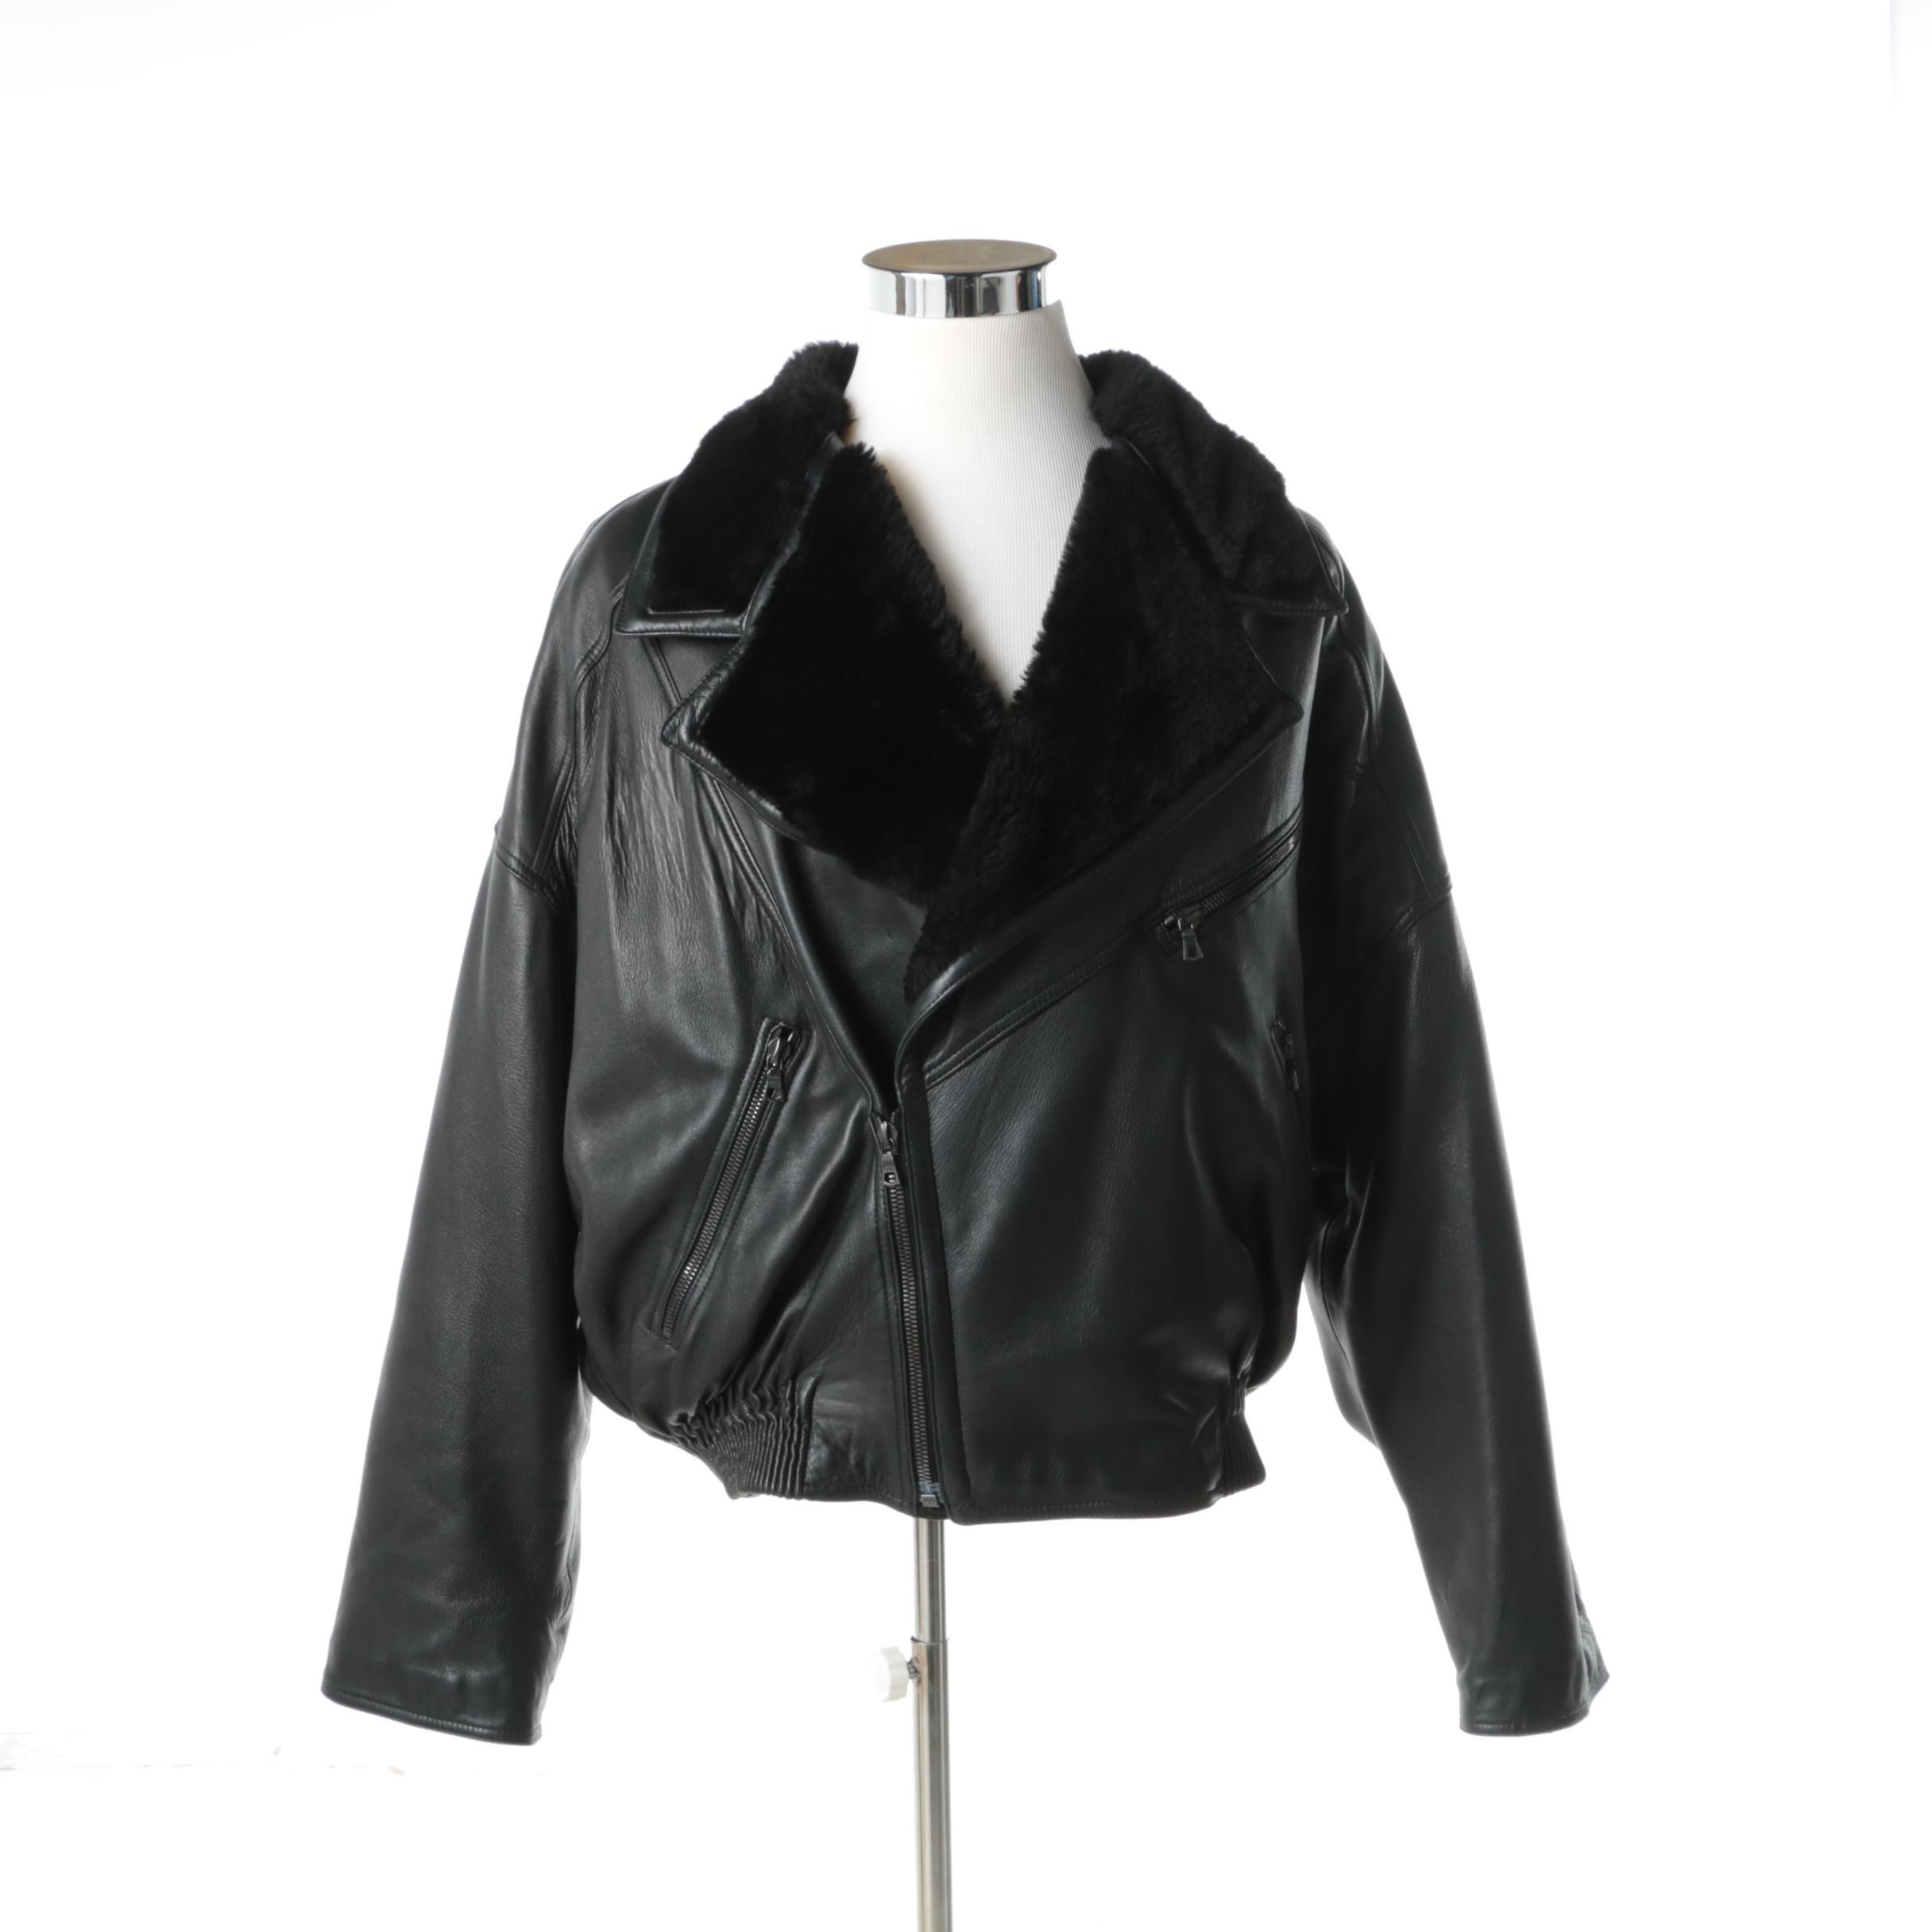 Men's Vintage Gianni Versace Leather Jacket